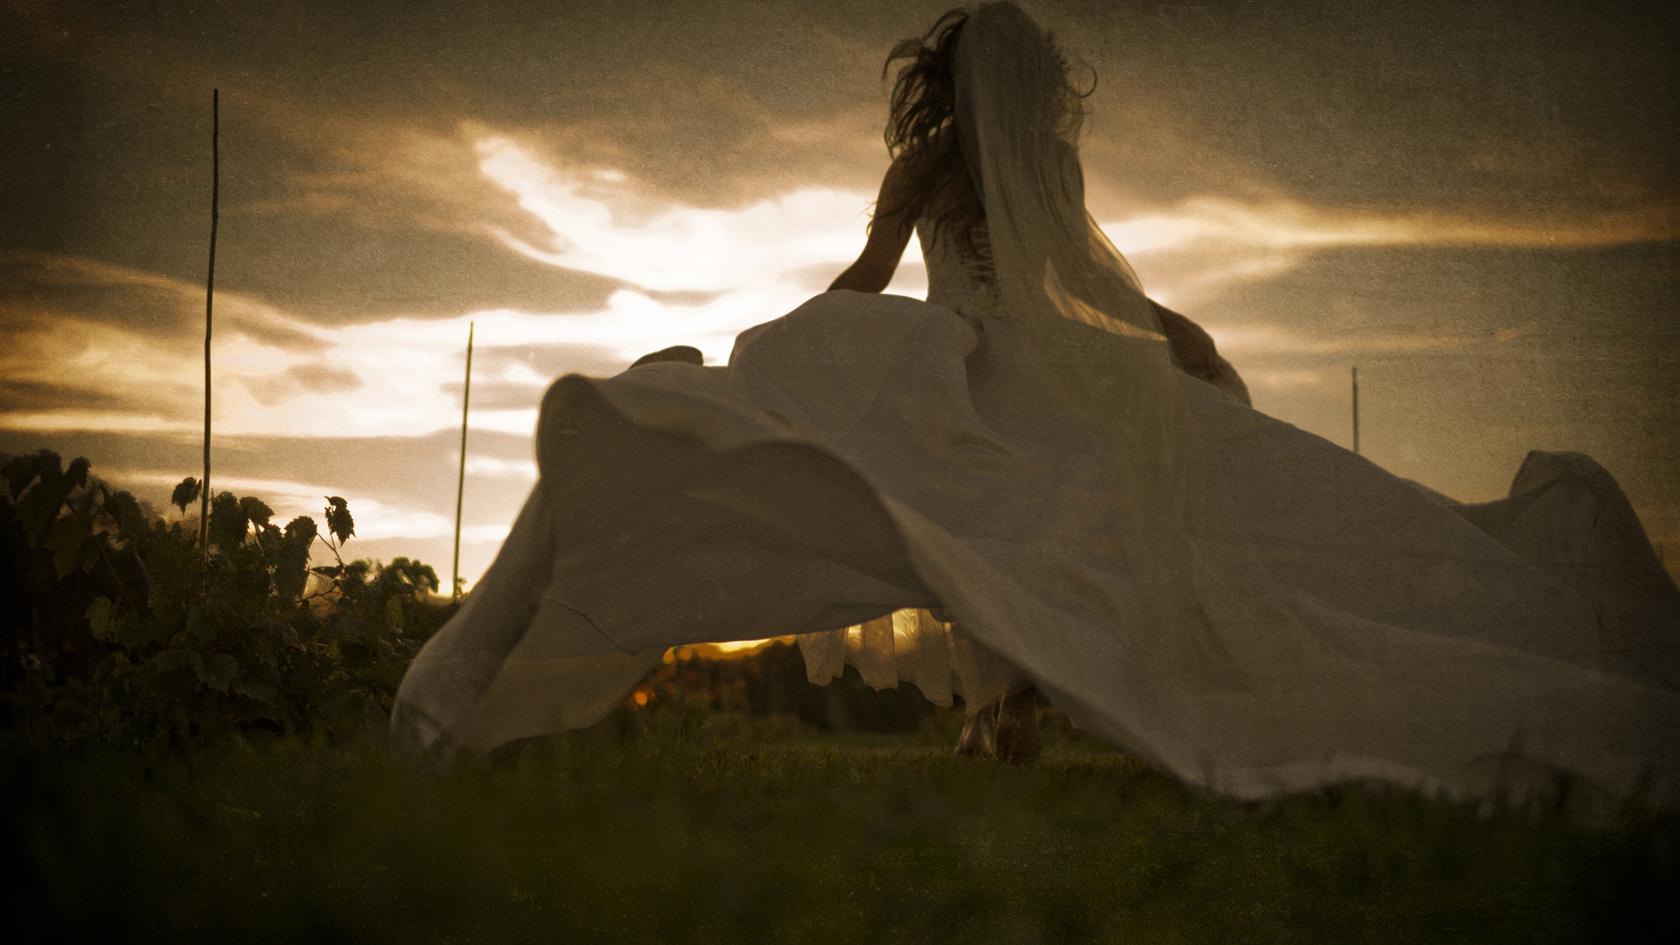 wedding_Photographer_Beloit_peer_canvas_bride_vines_dc_Estate.jpg